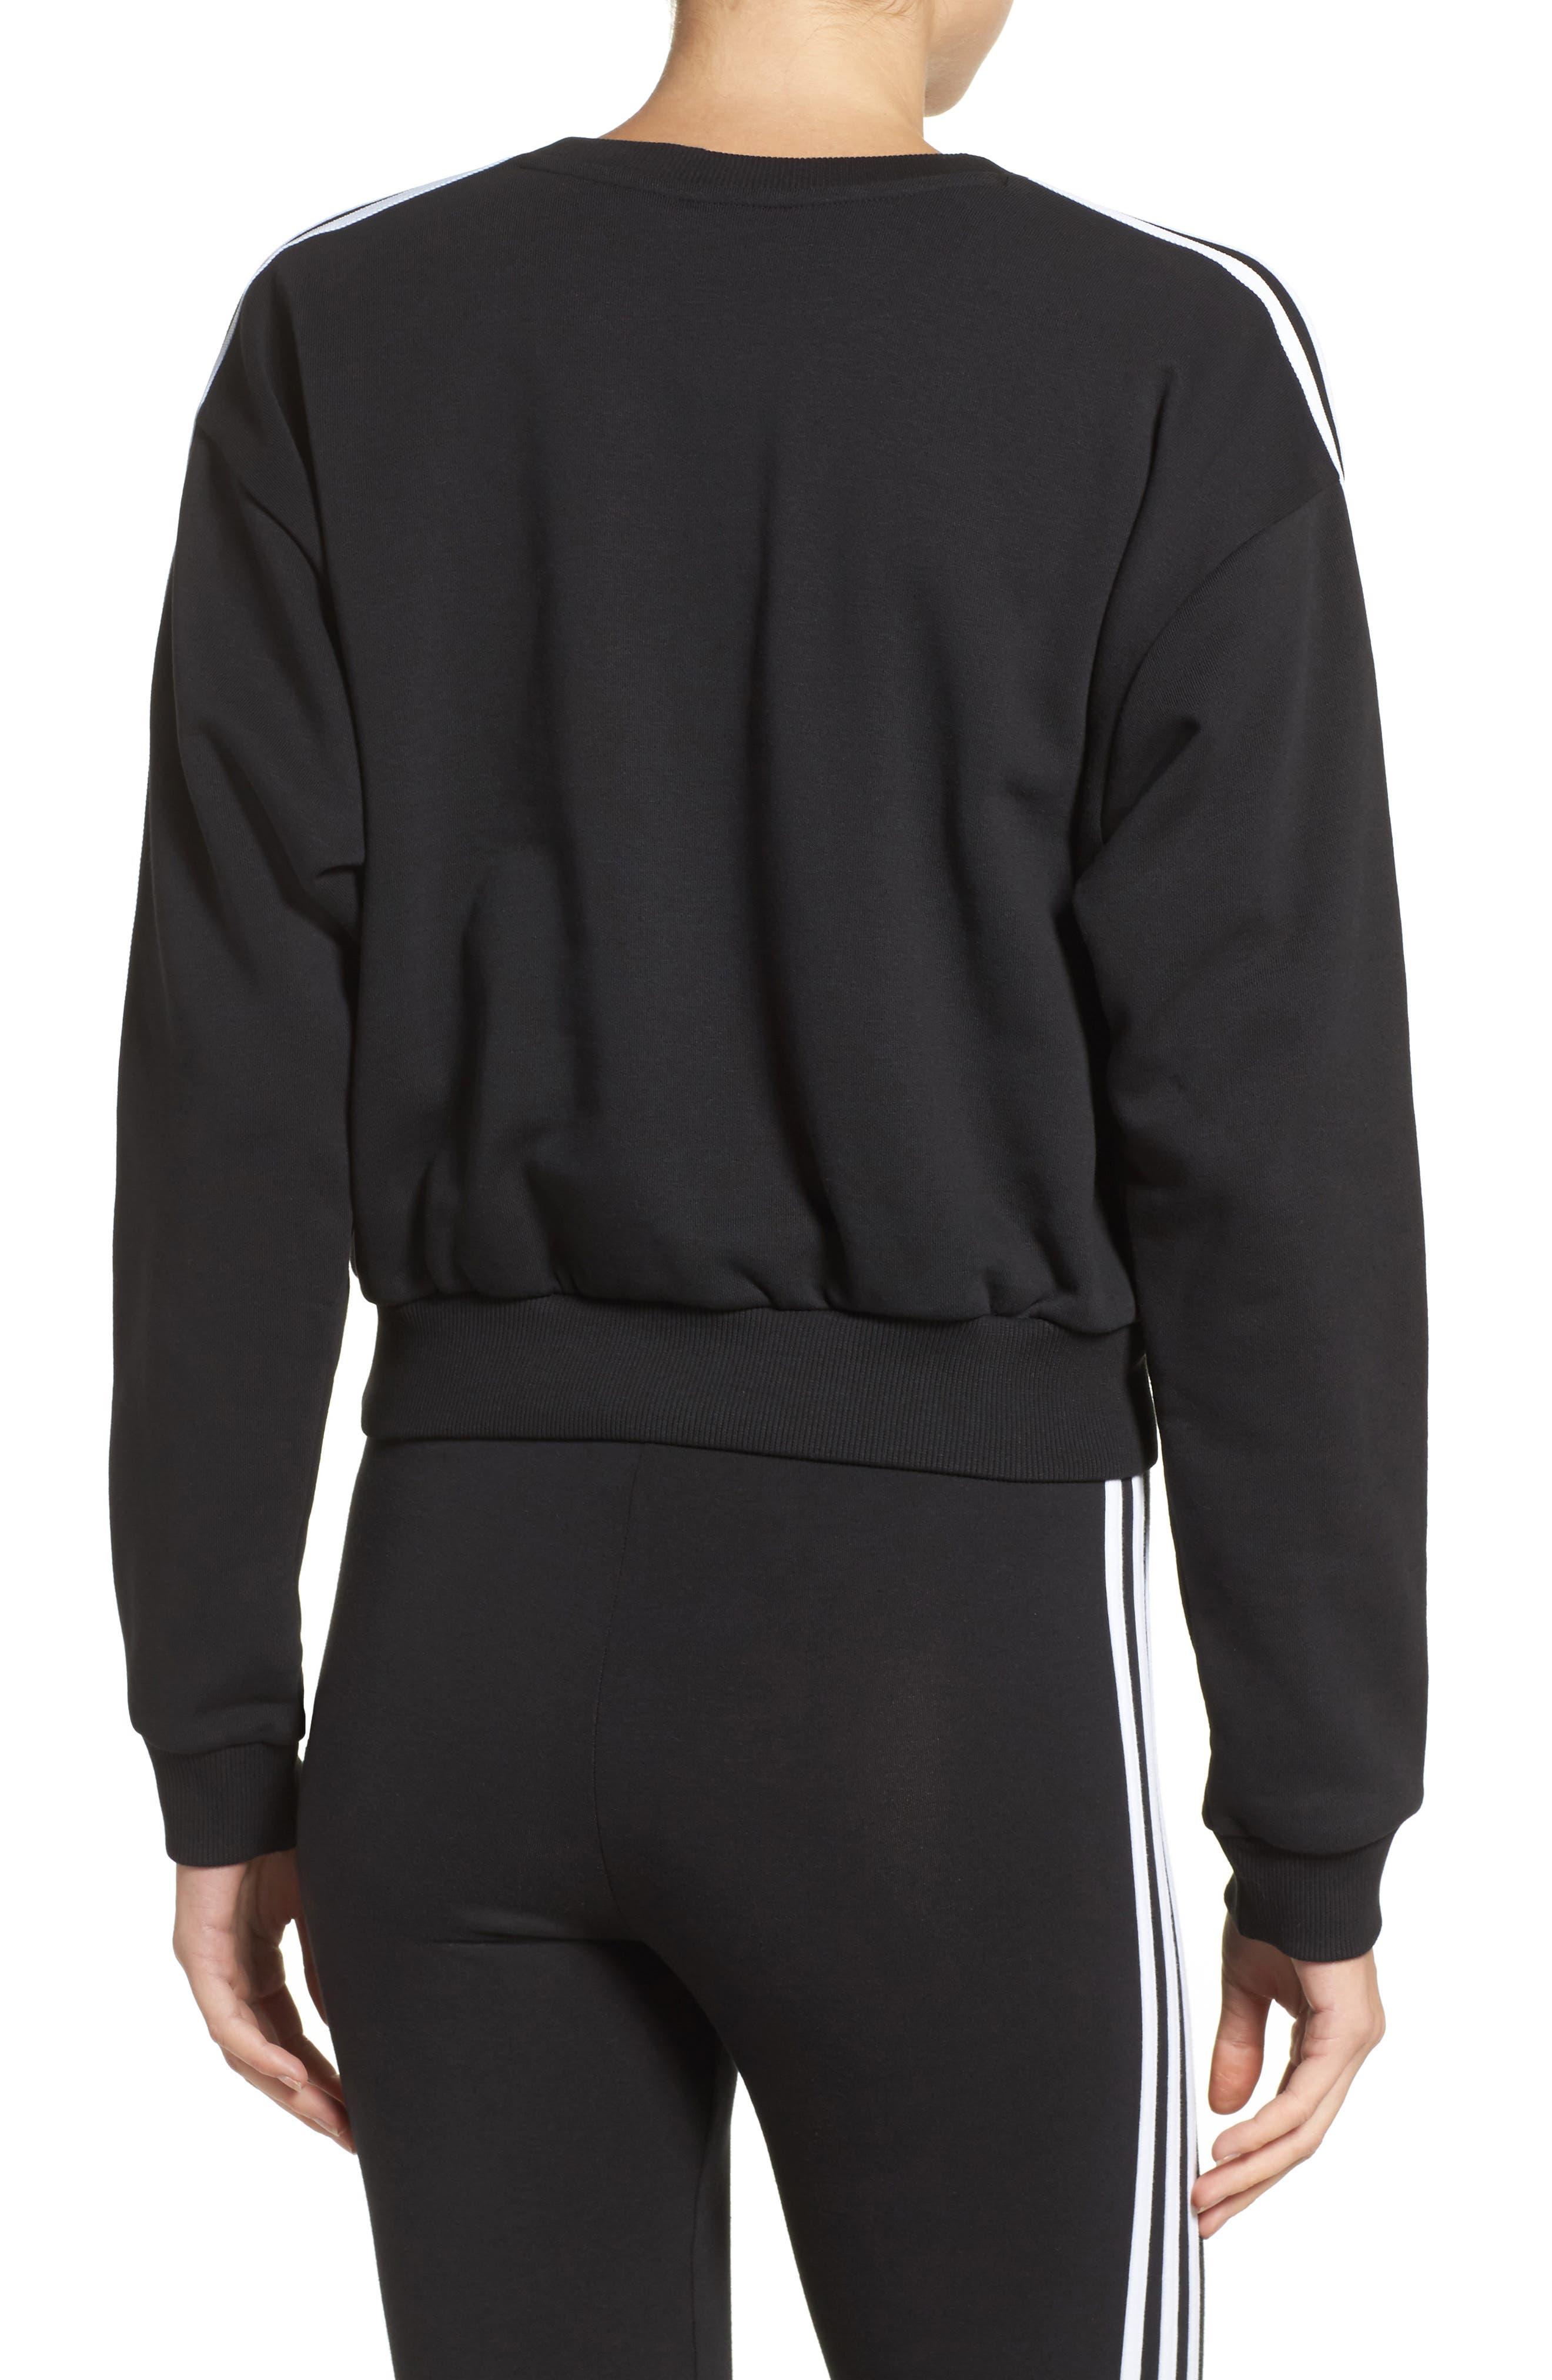 Alternate Image 2  - adidas Originals 3-Stripes Crop Sweatshirt